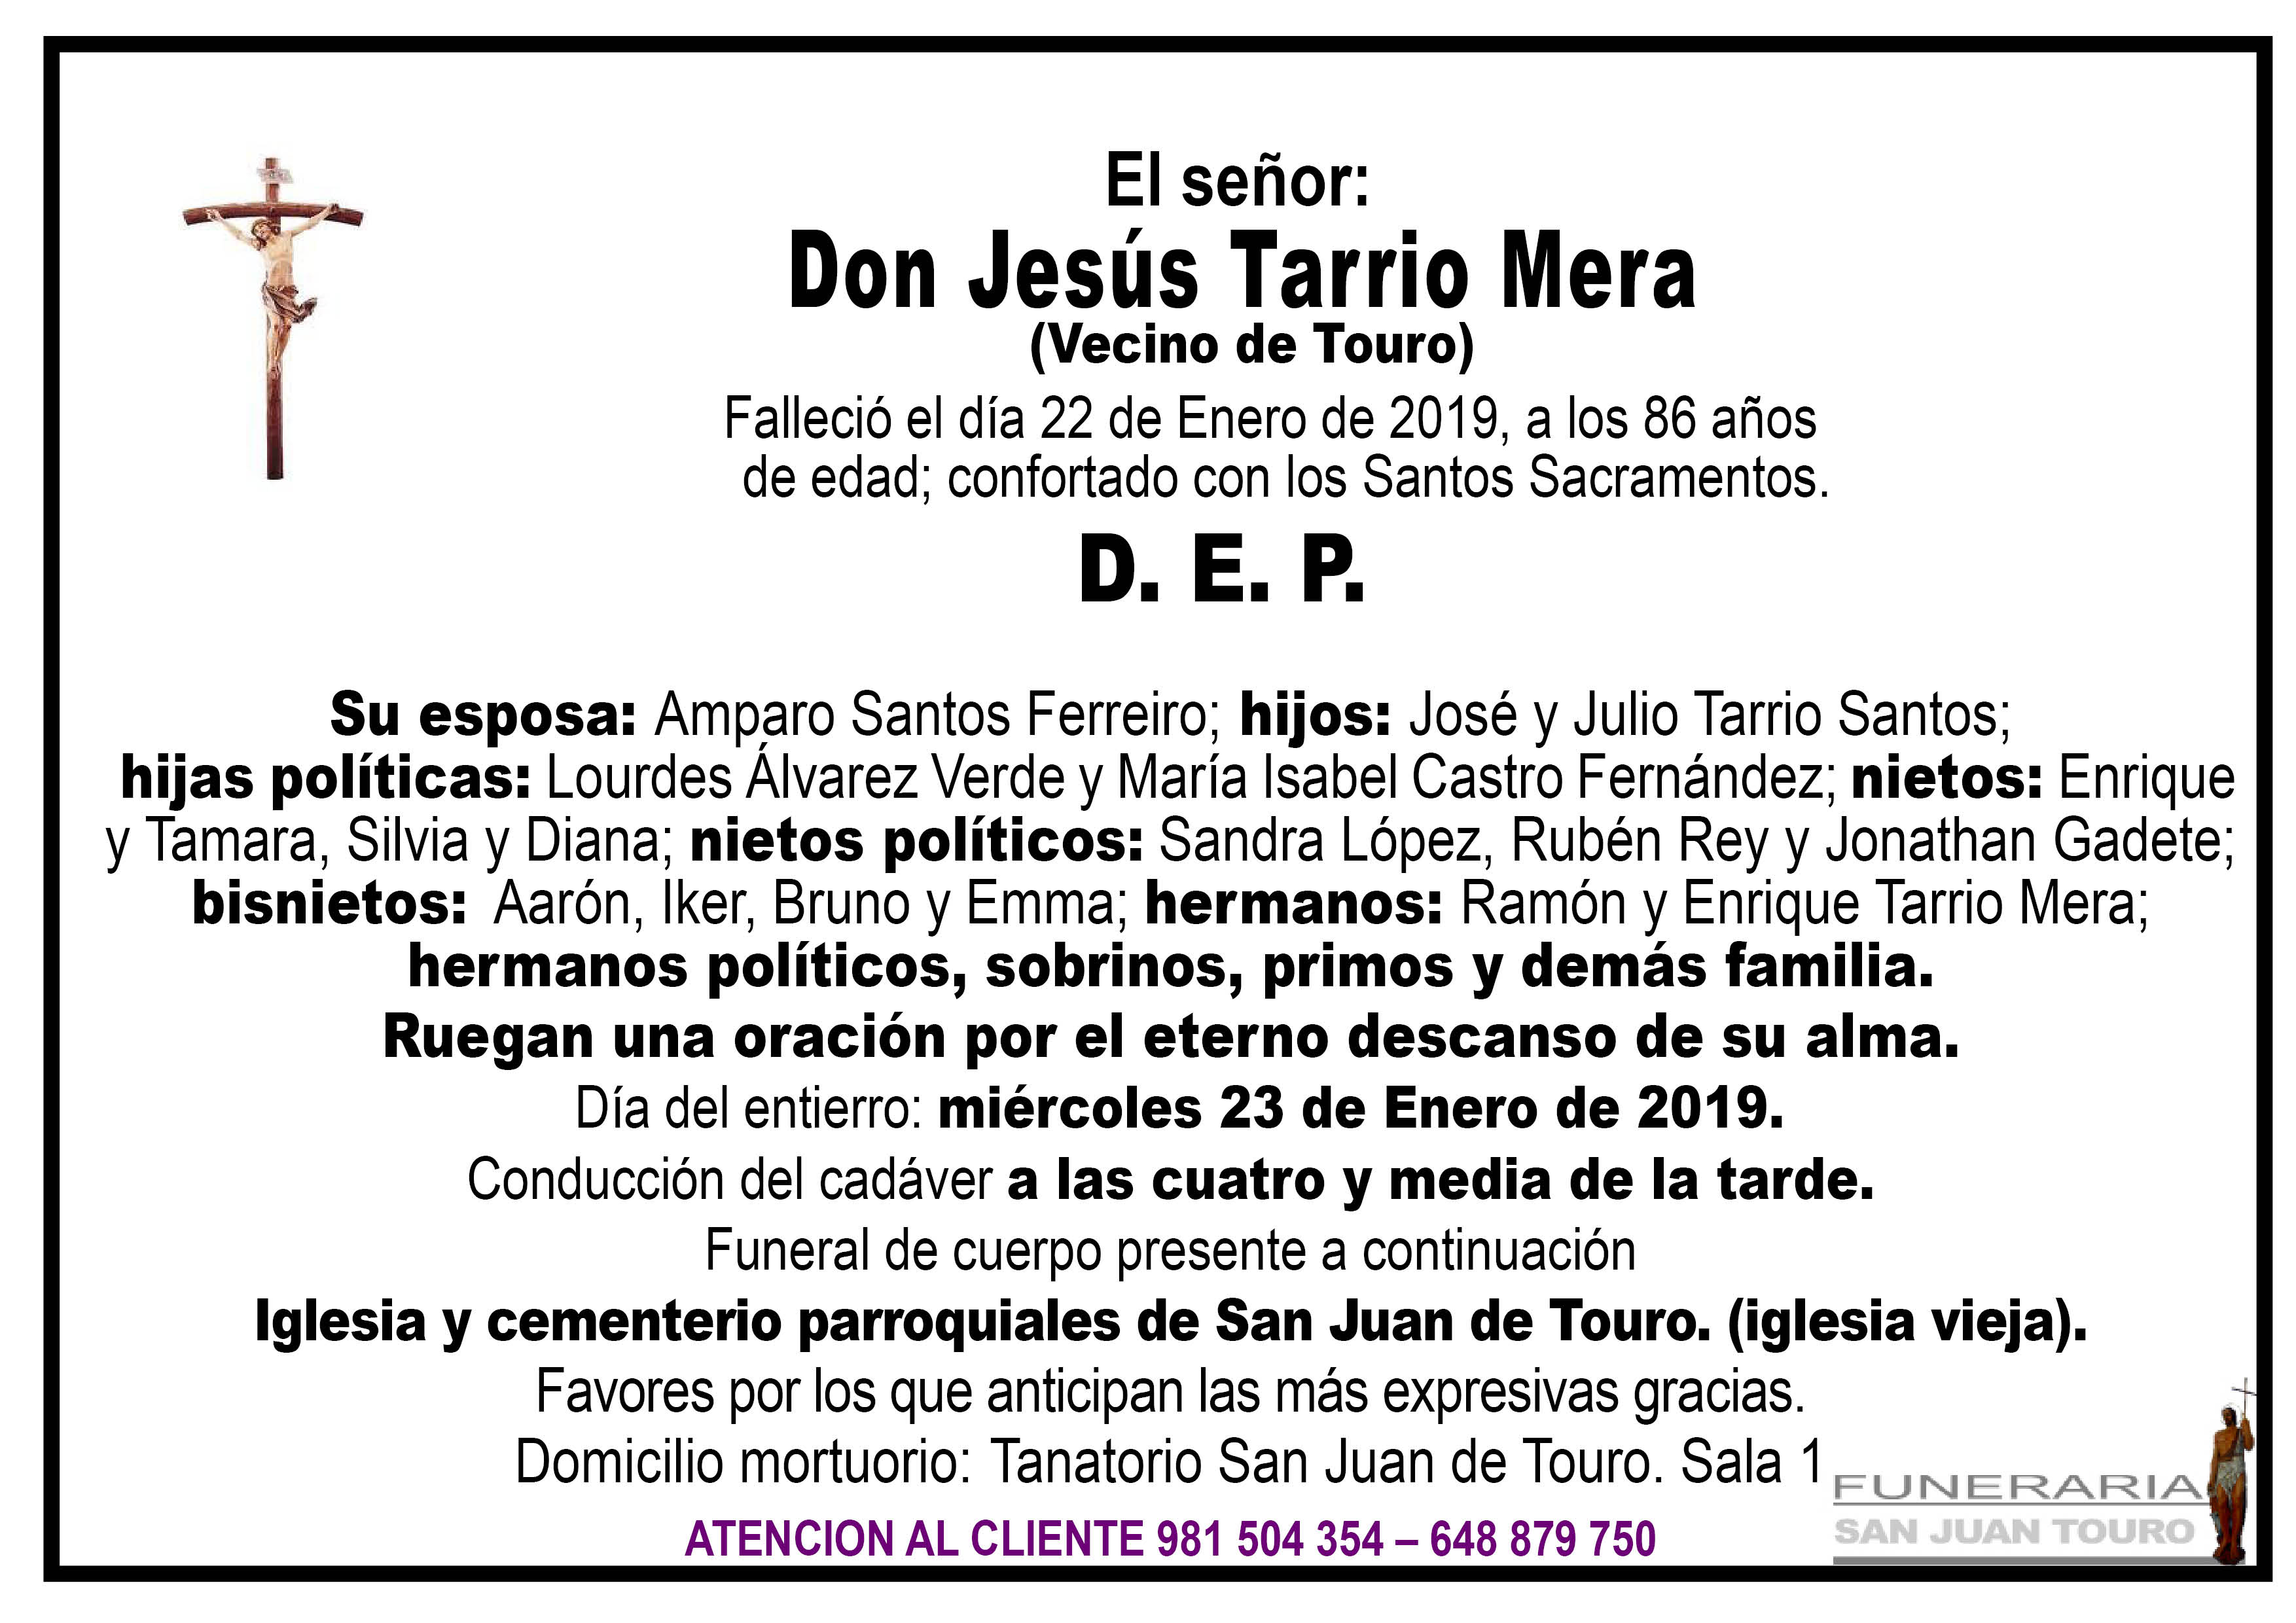 Esquela de SEPELIO DE DON JESÚS TARRIO MERA